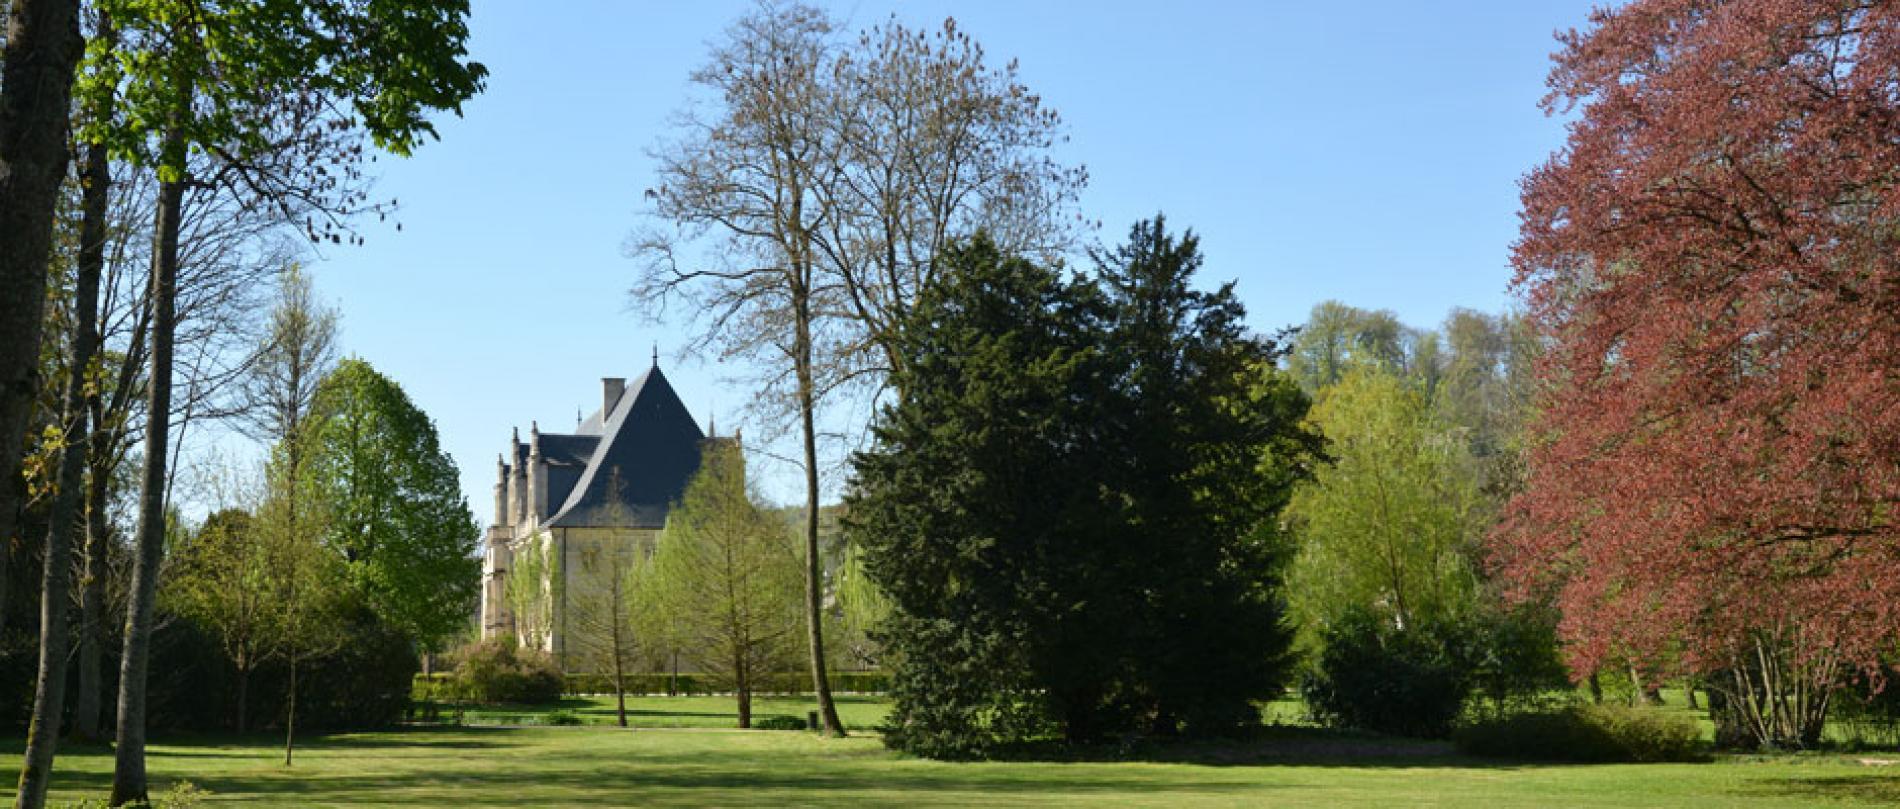 Château du Grand Jardin de Joinville